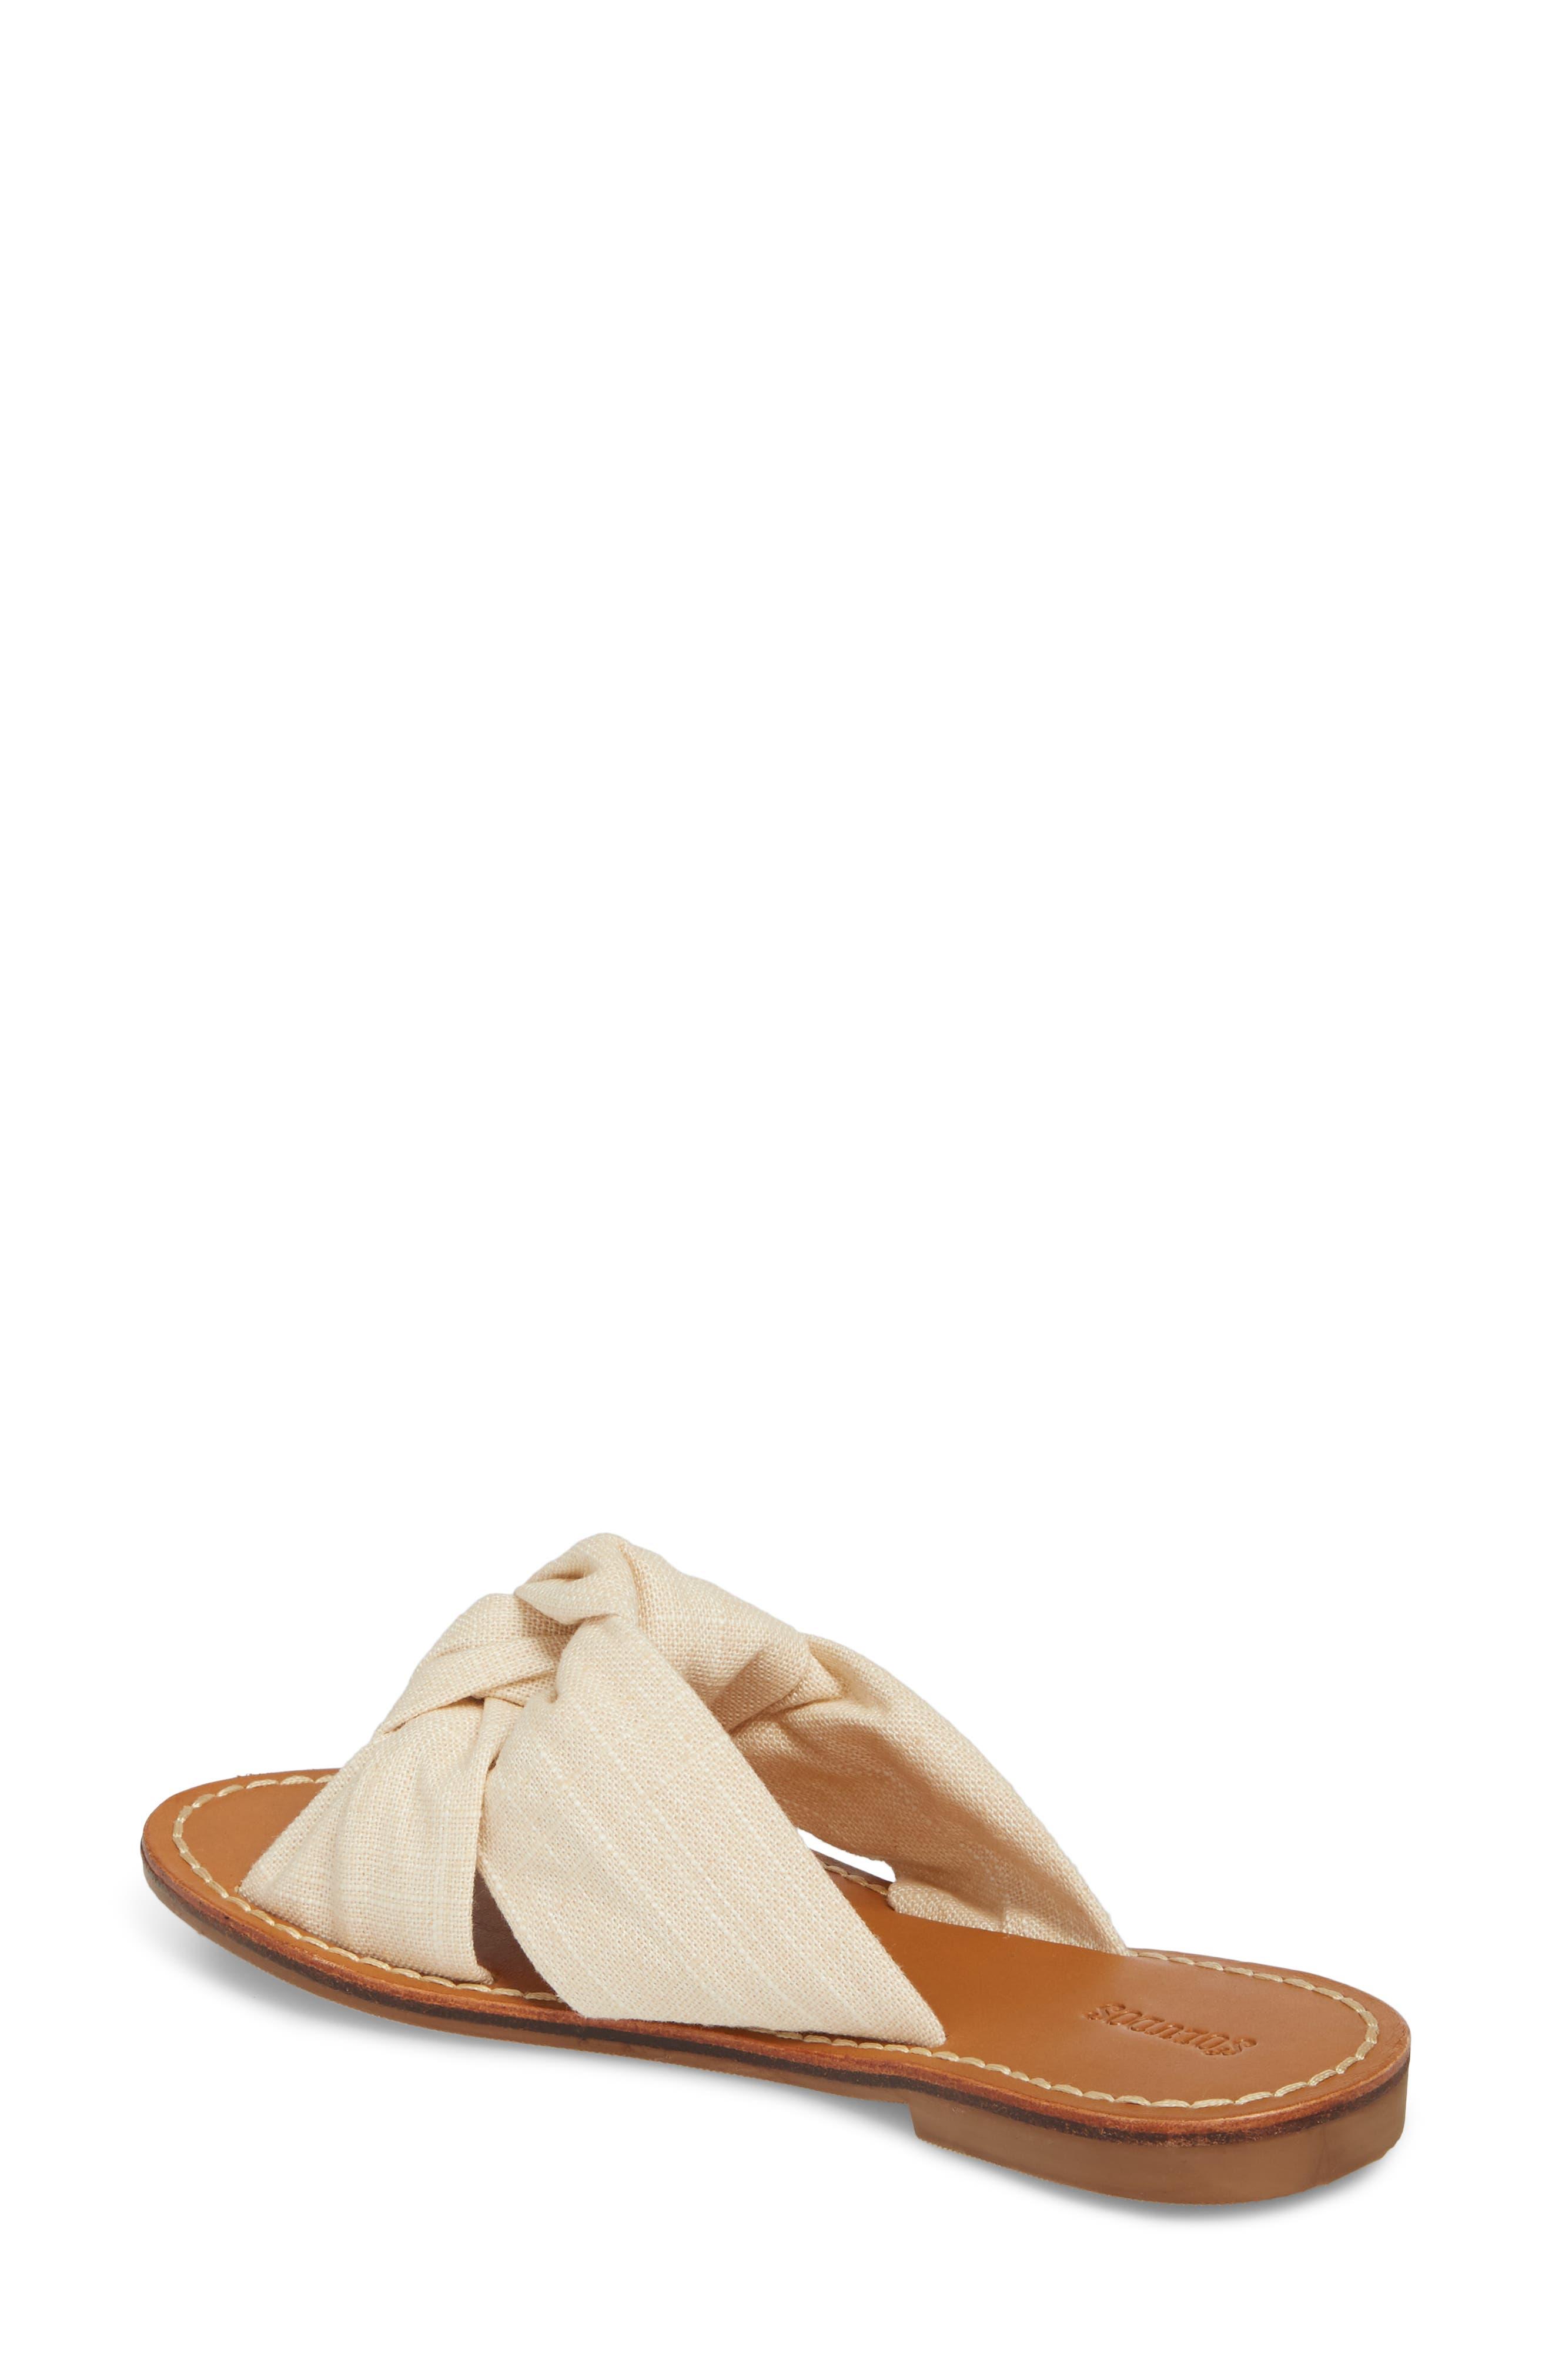 Knotted Slide Sandal,                             Alternate thumbnail 2, color,                             Blush Fabric